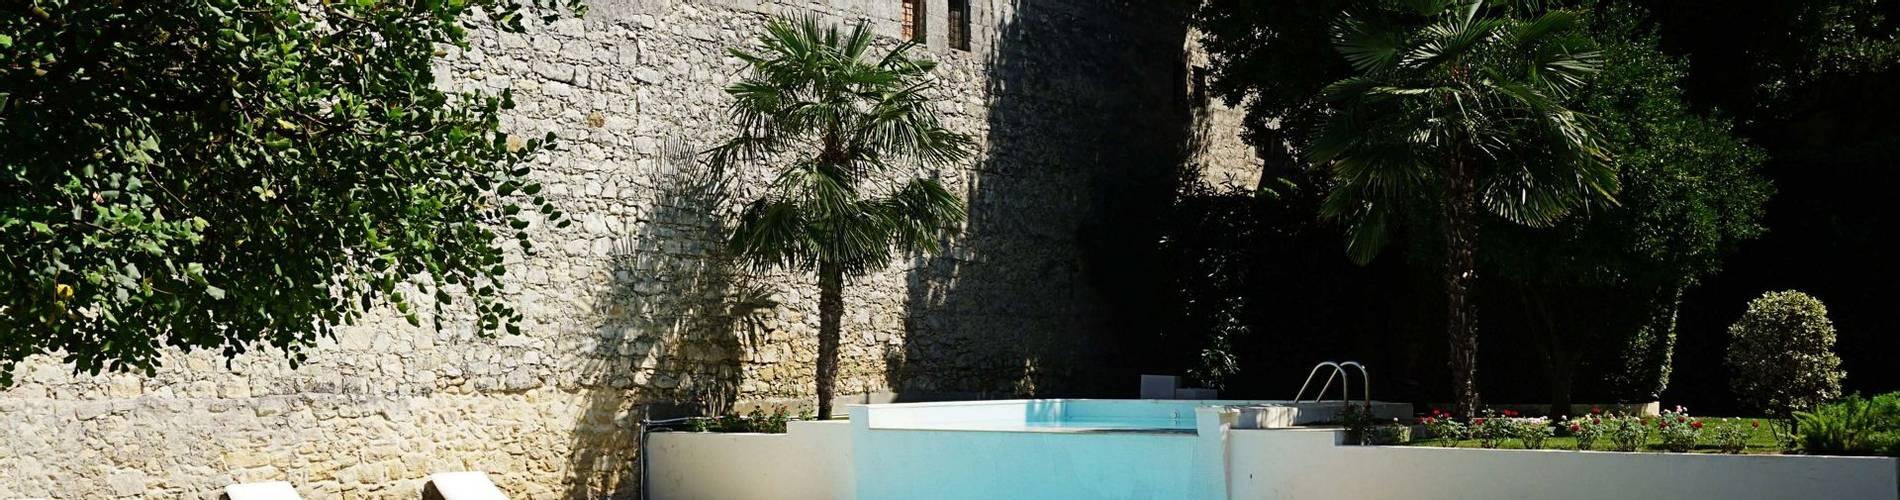 Villa Del Lauro, Sicily, Italy (2).jpg